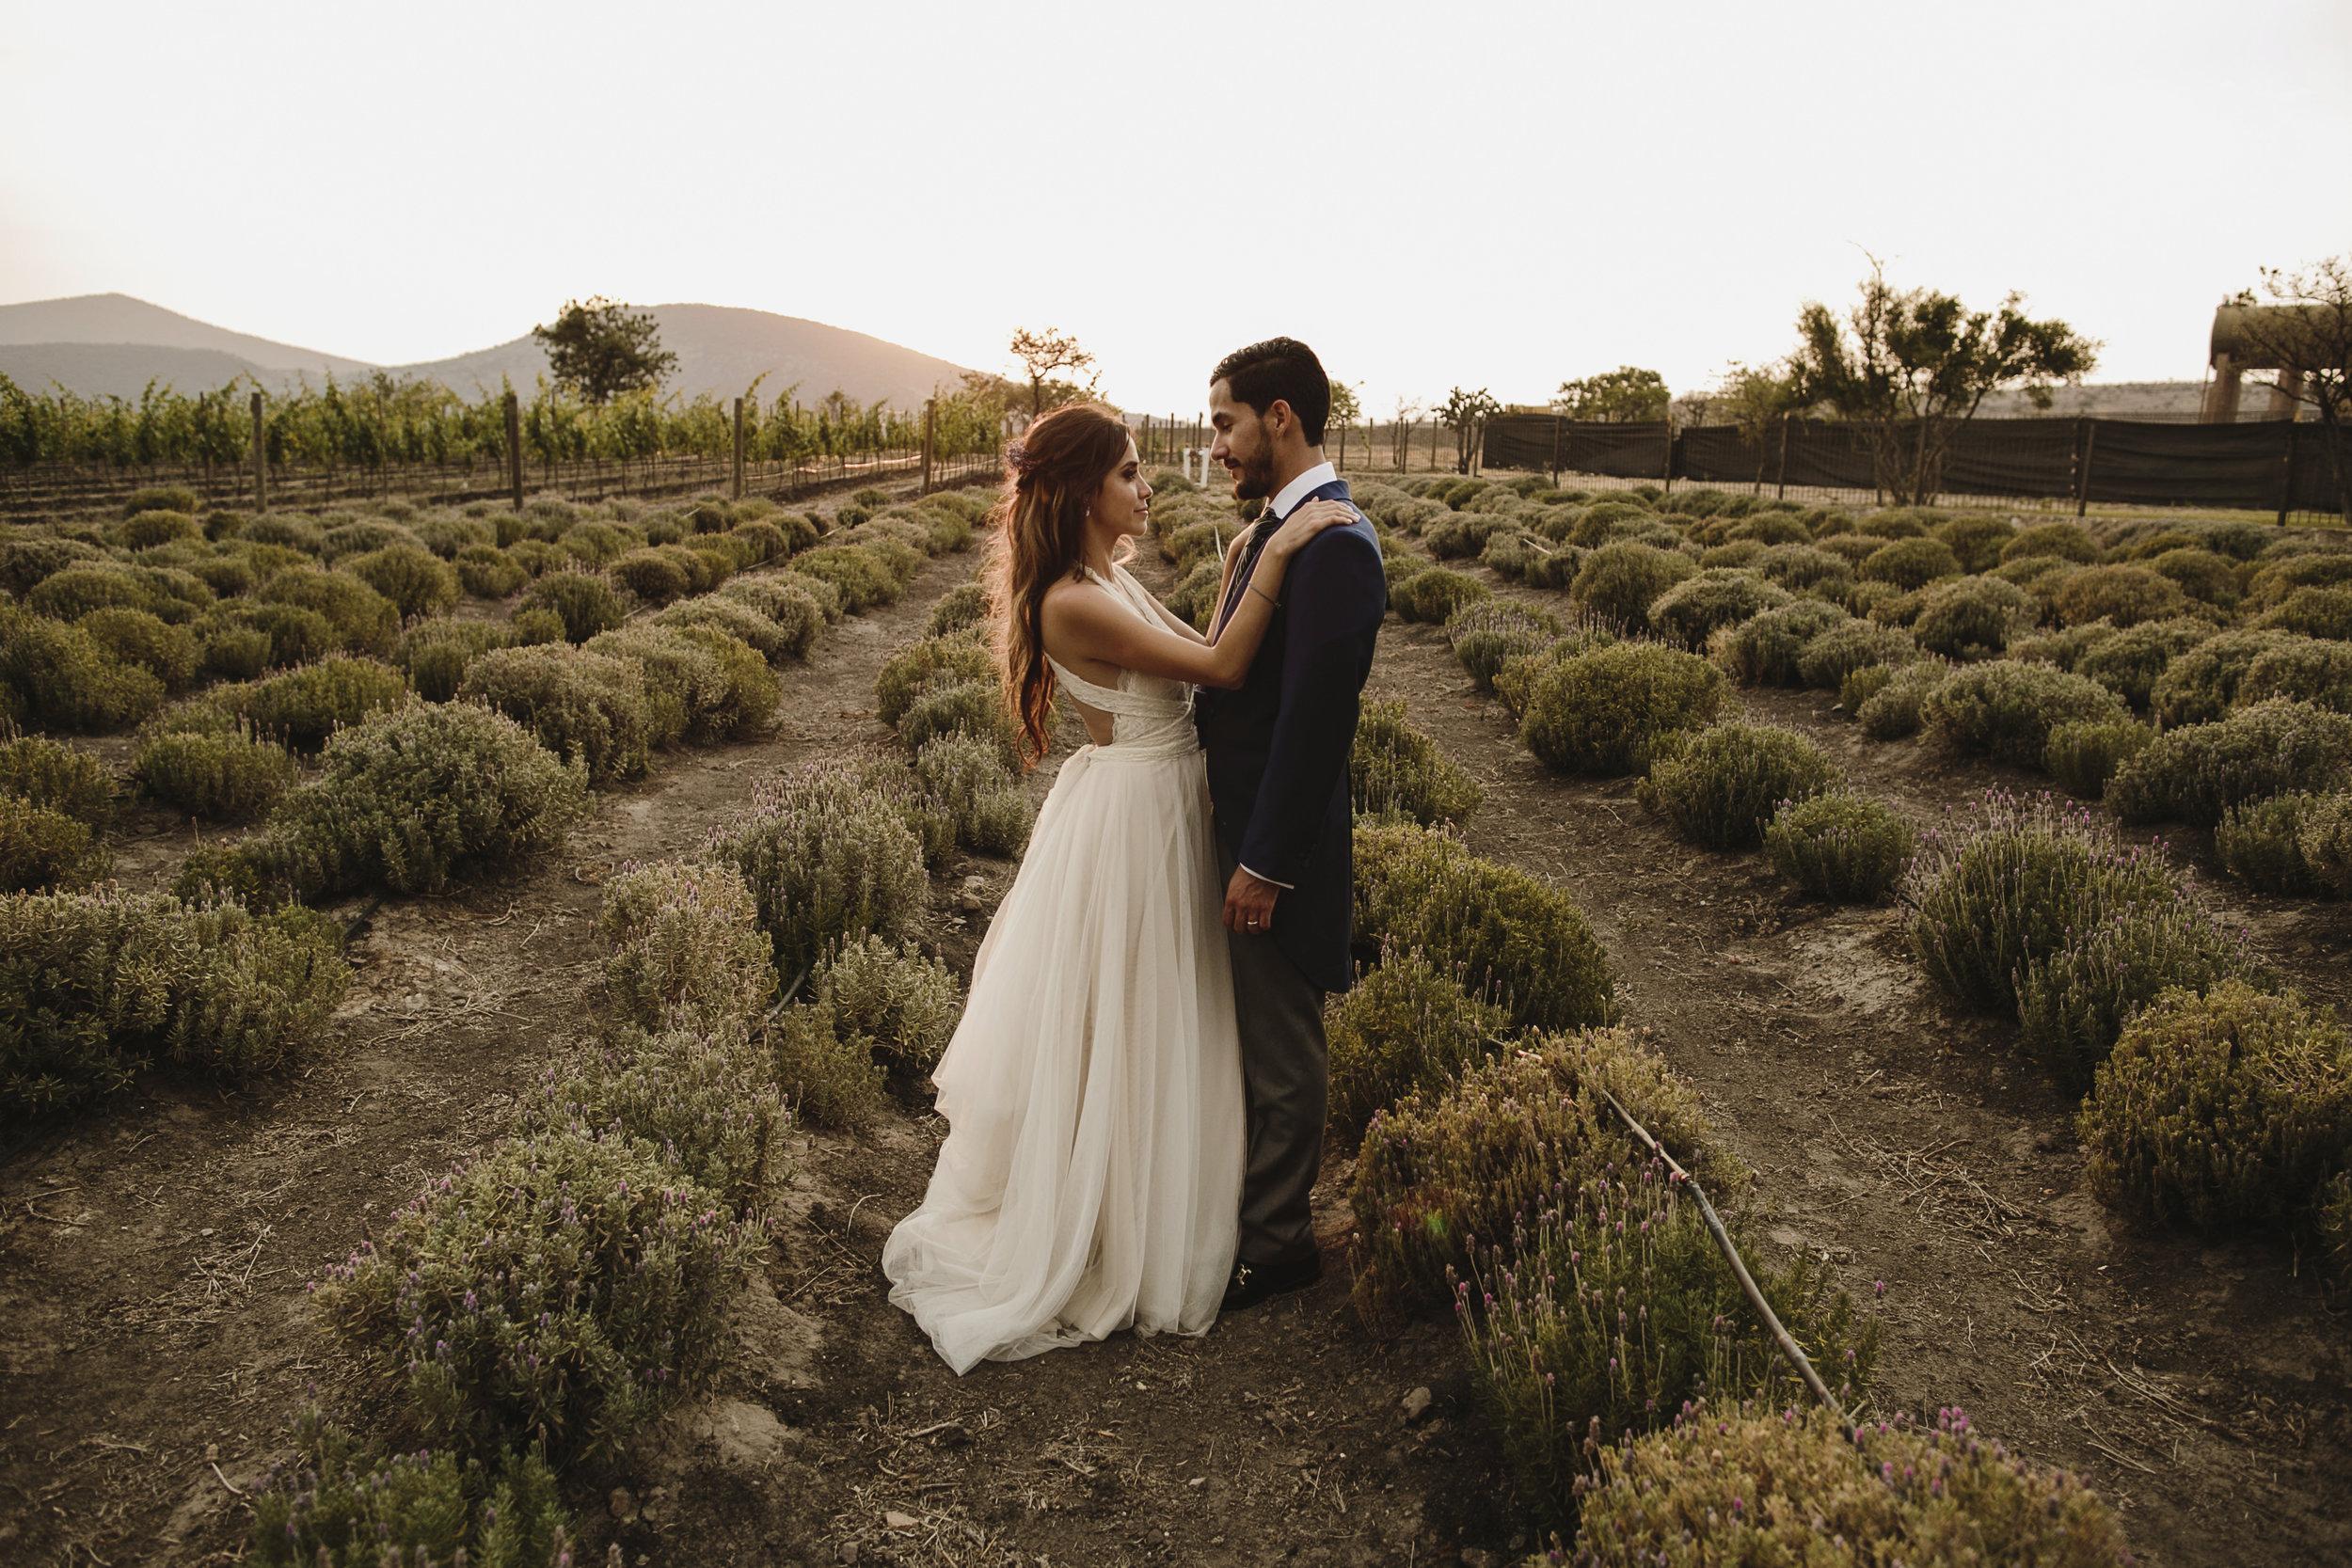 alfons_flores_destination_wedding_photography_mavi_david-1862.JPG